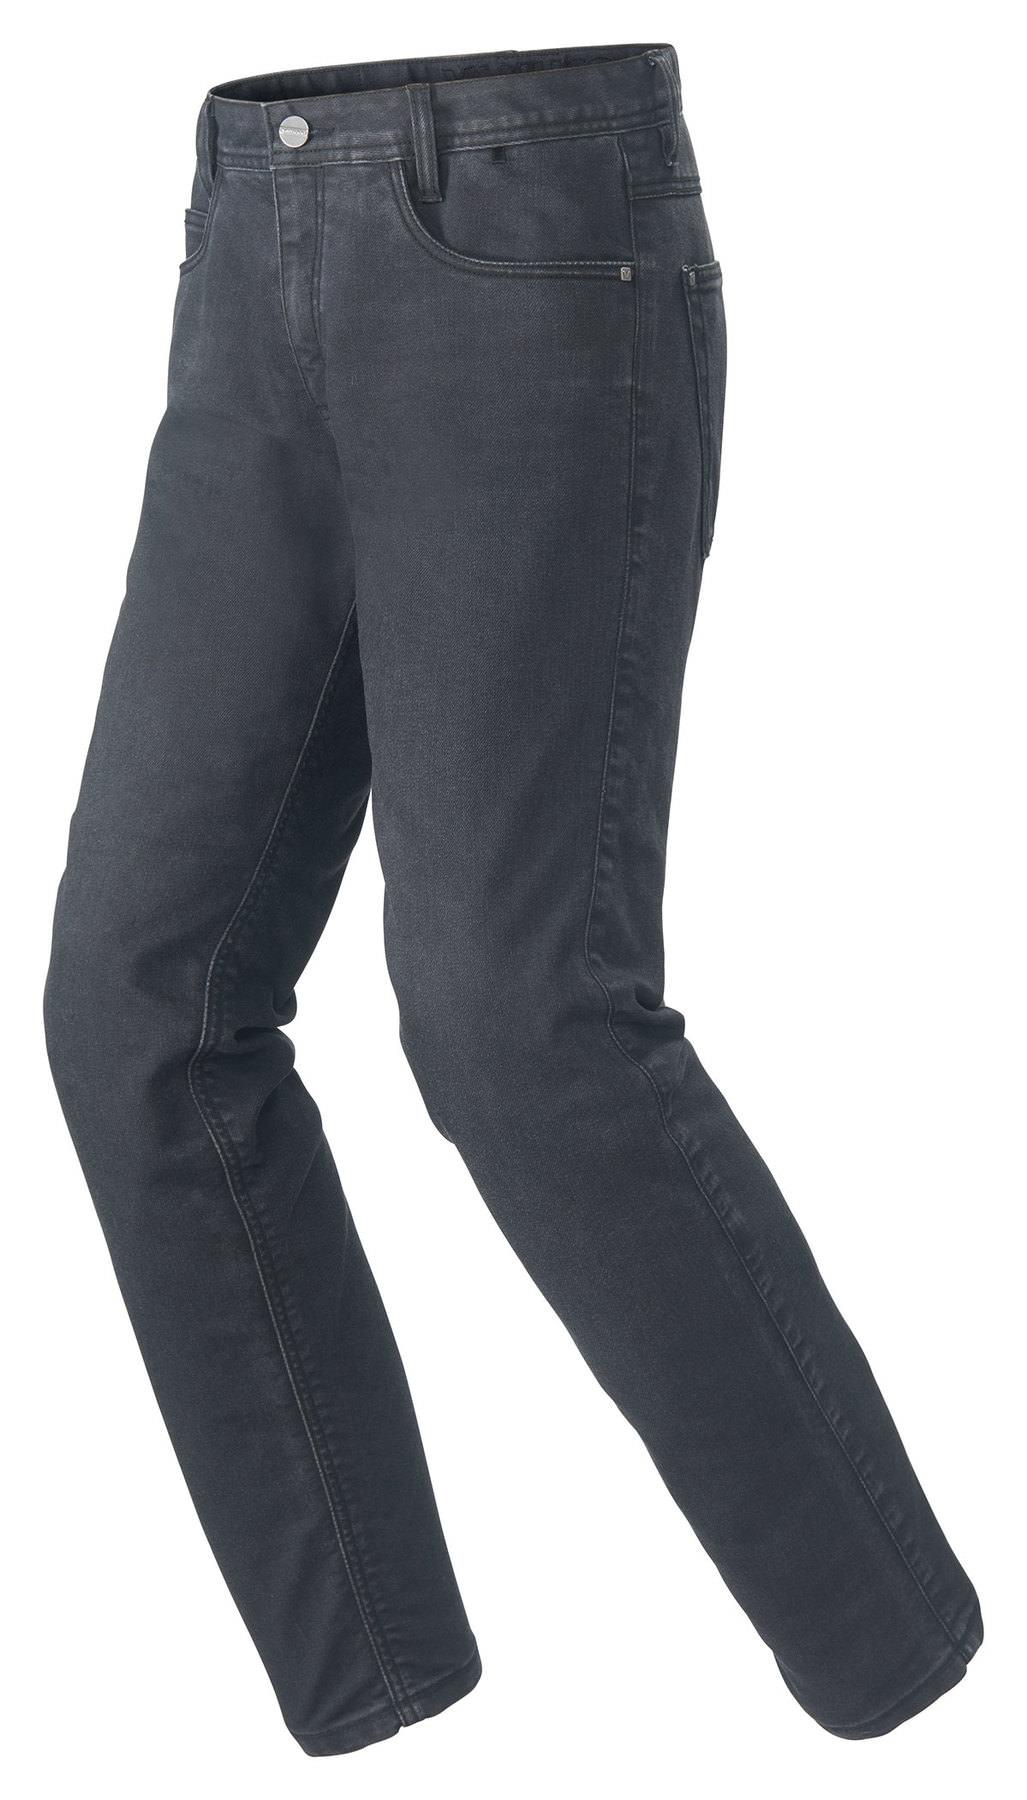 Vanucci Cordura 2 men's slim jeans